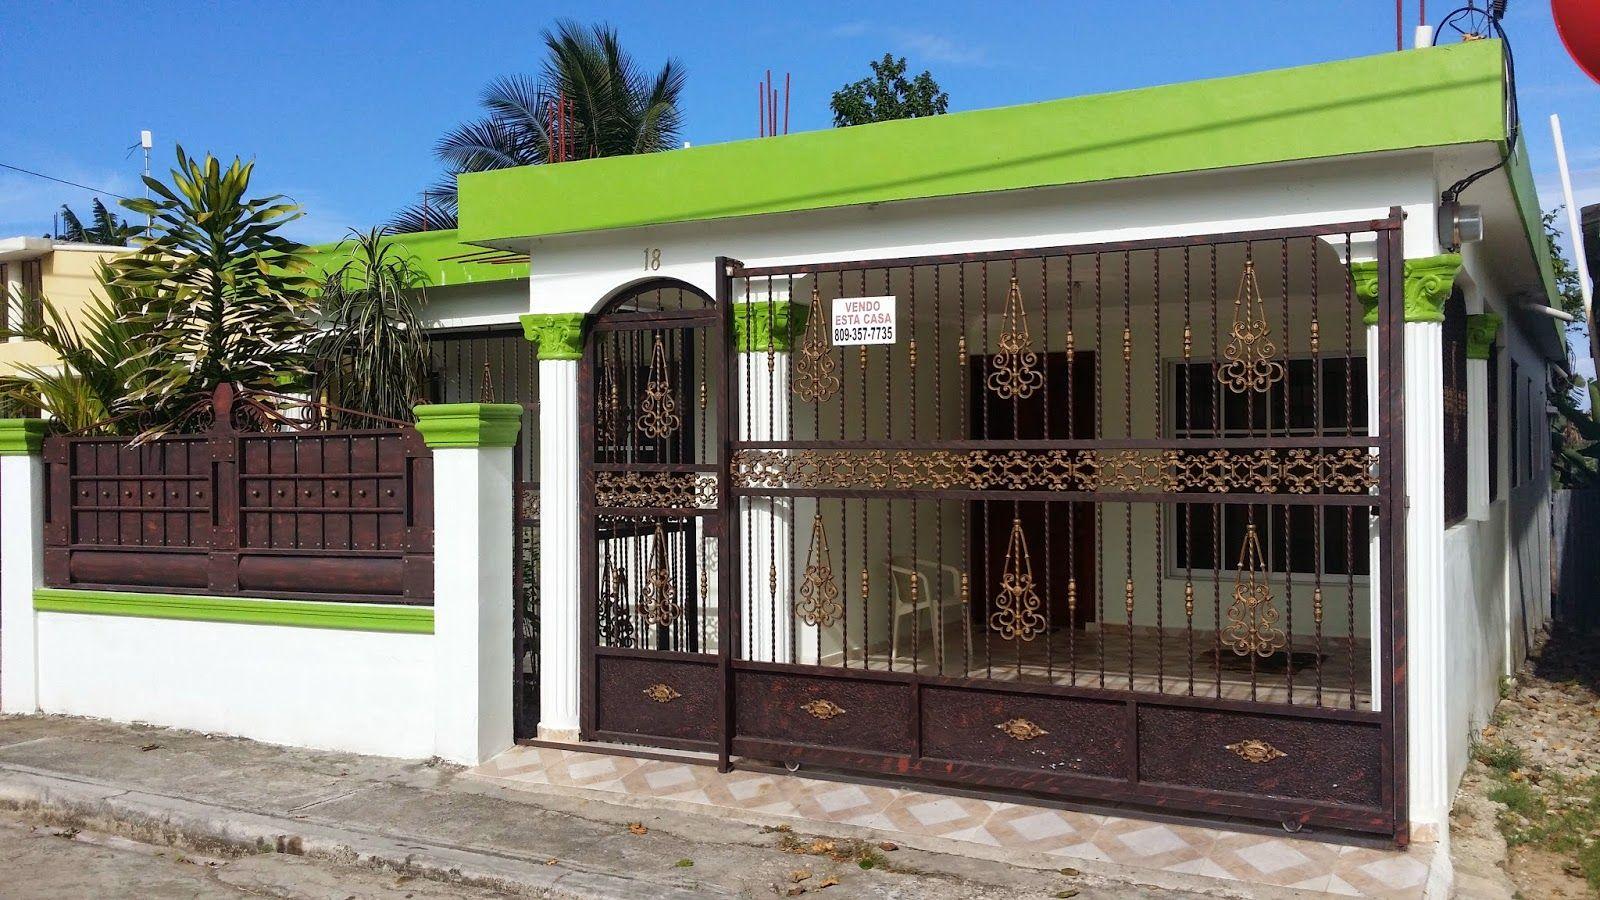 Puertas de hierro para marquesina buscar con google for Marquesinas para puertas